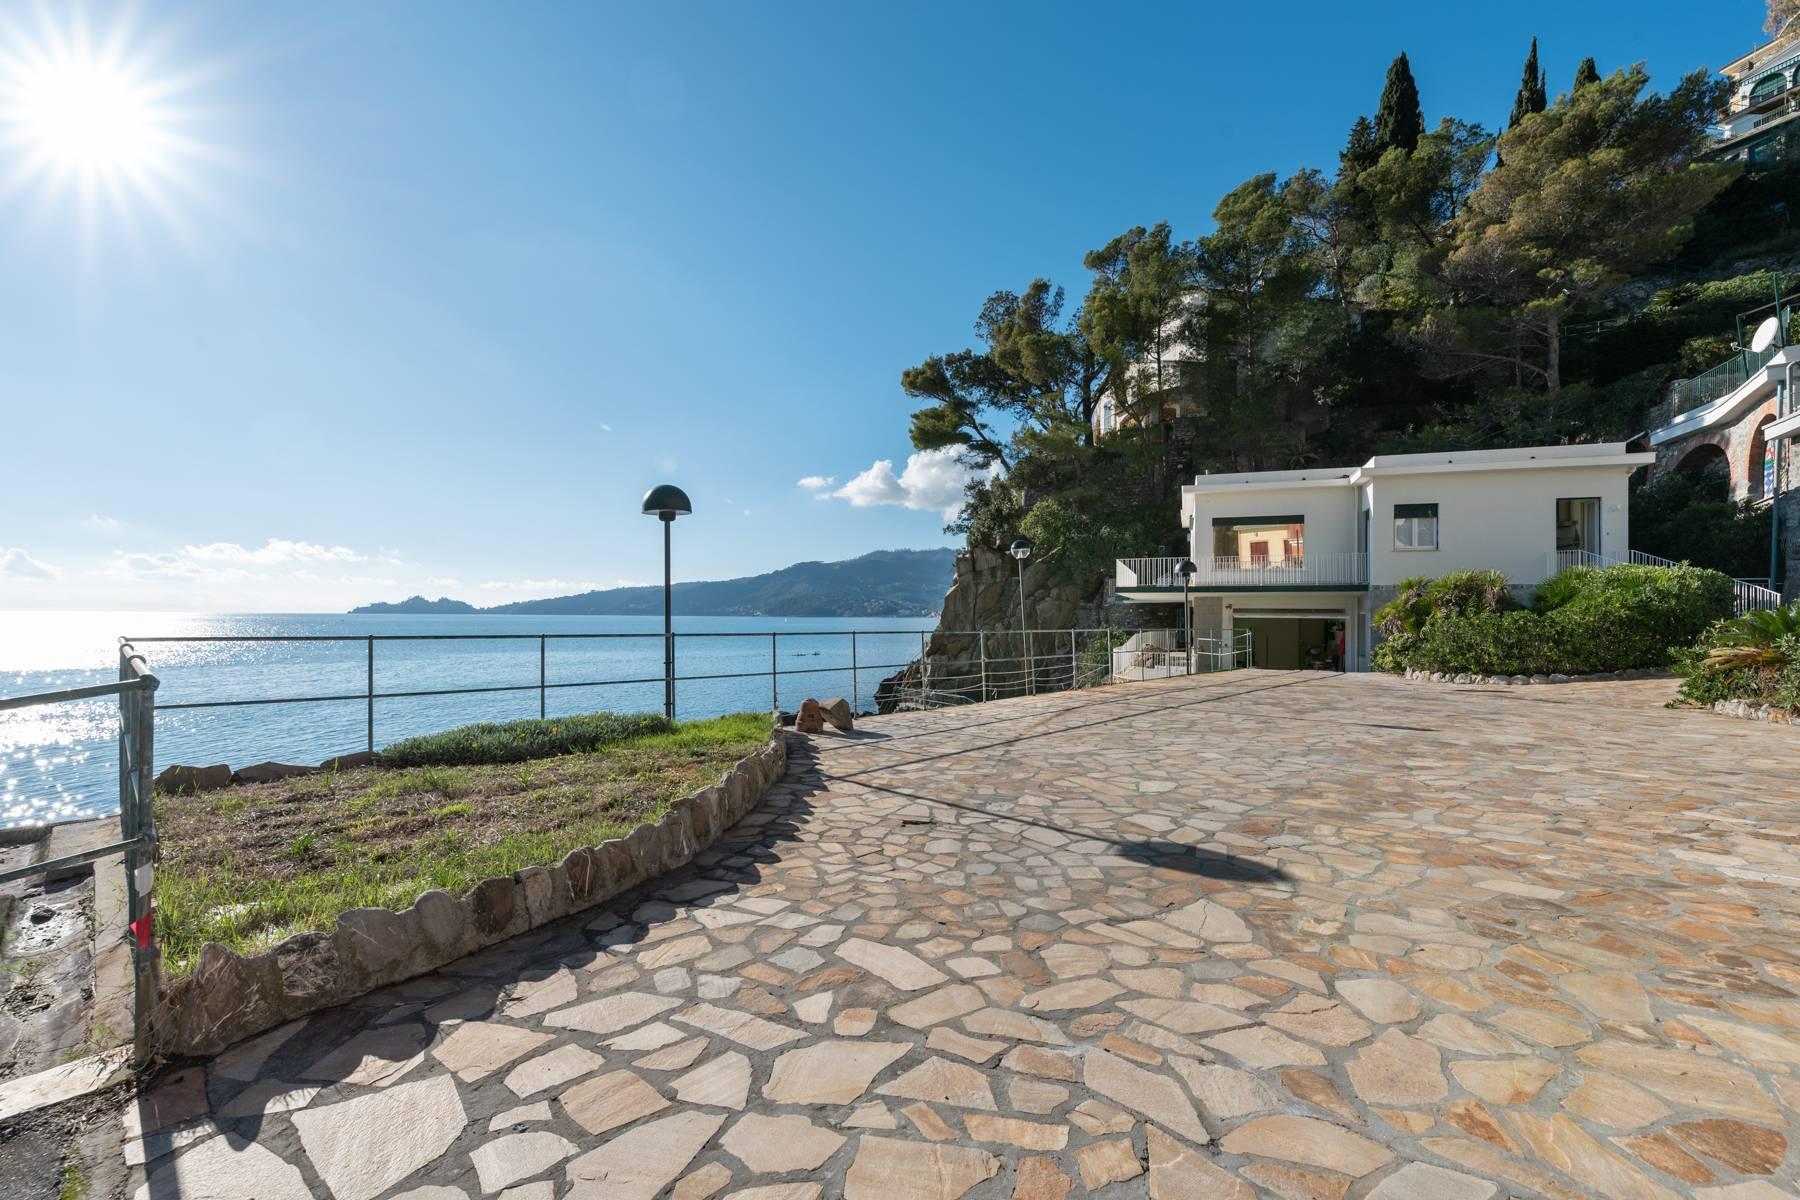 Casa indipendente in Vendita a Zoagli: 5 locali, 300 mq